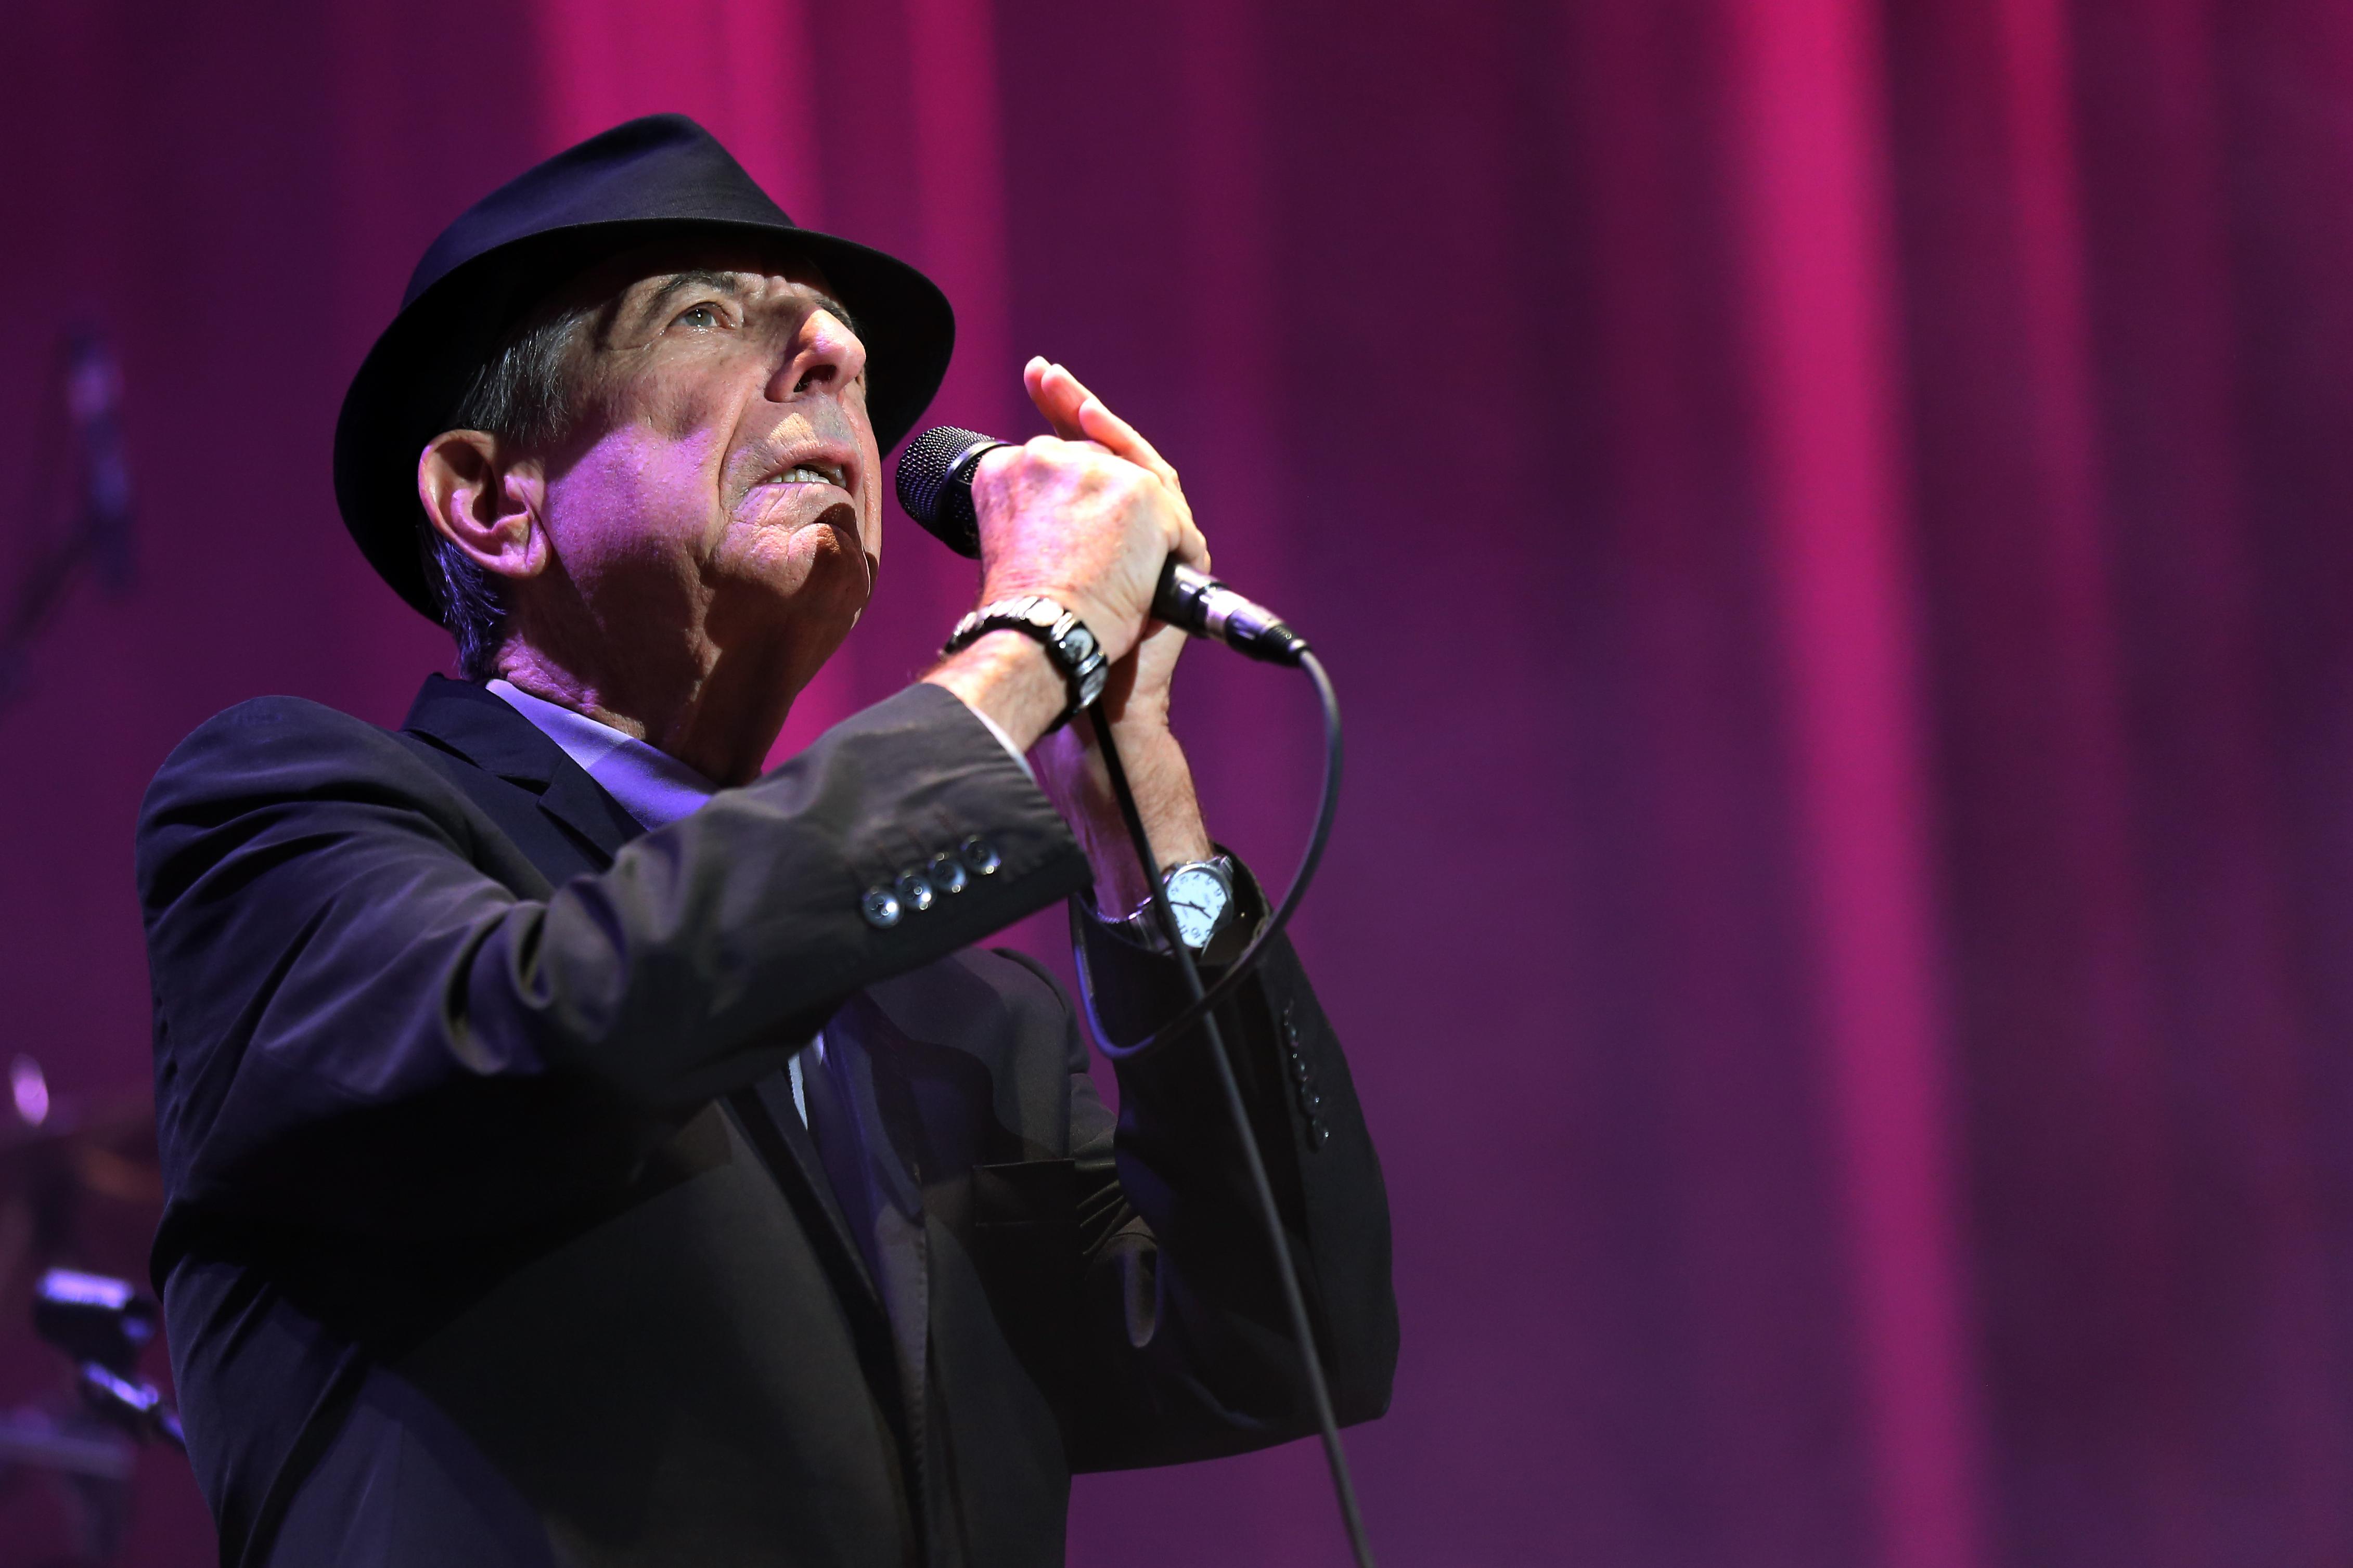 Hallelujah Christmas Lyrics Leonard Cohen.Story Of Leonard Cohen S Hallelujah Is Told In New Book